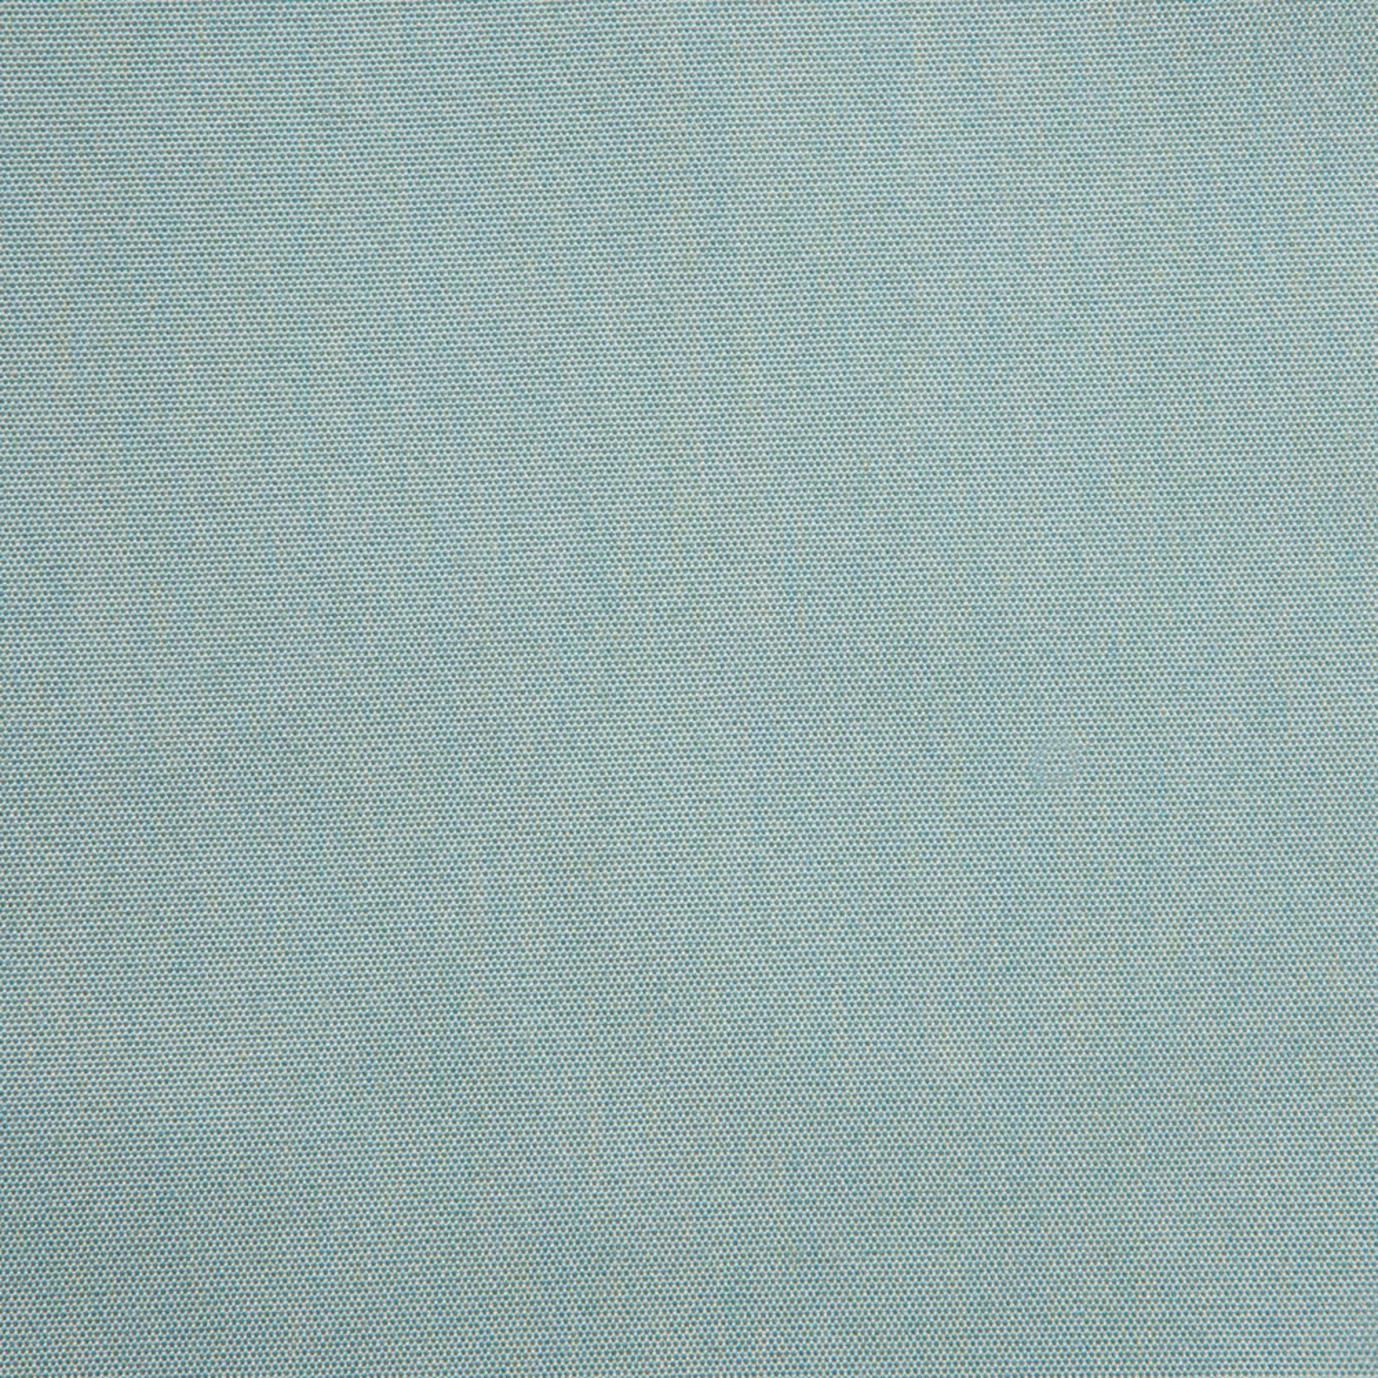 Deco™ 5pc Barstool Set - Bliss Blue